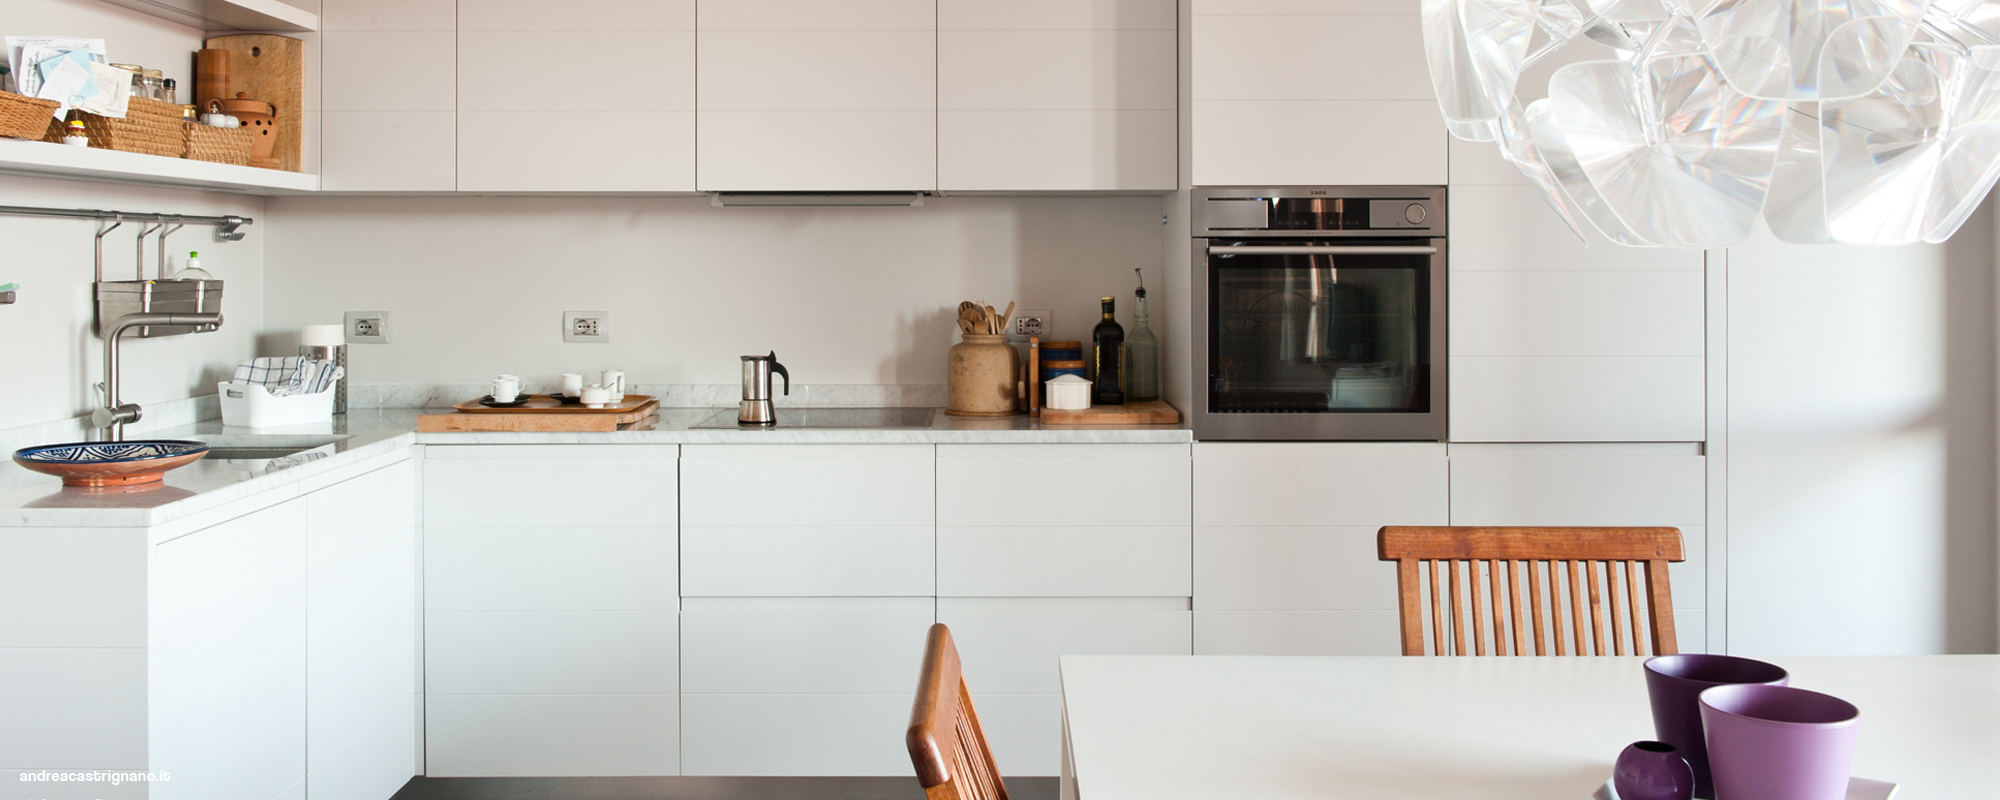 Banquette idee rangement - Cucine in piccoli spazi ...